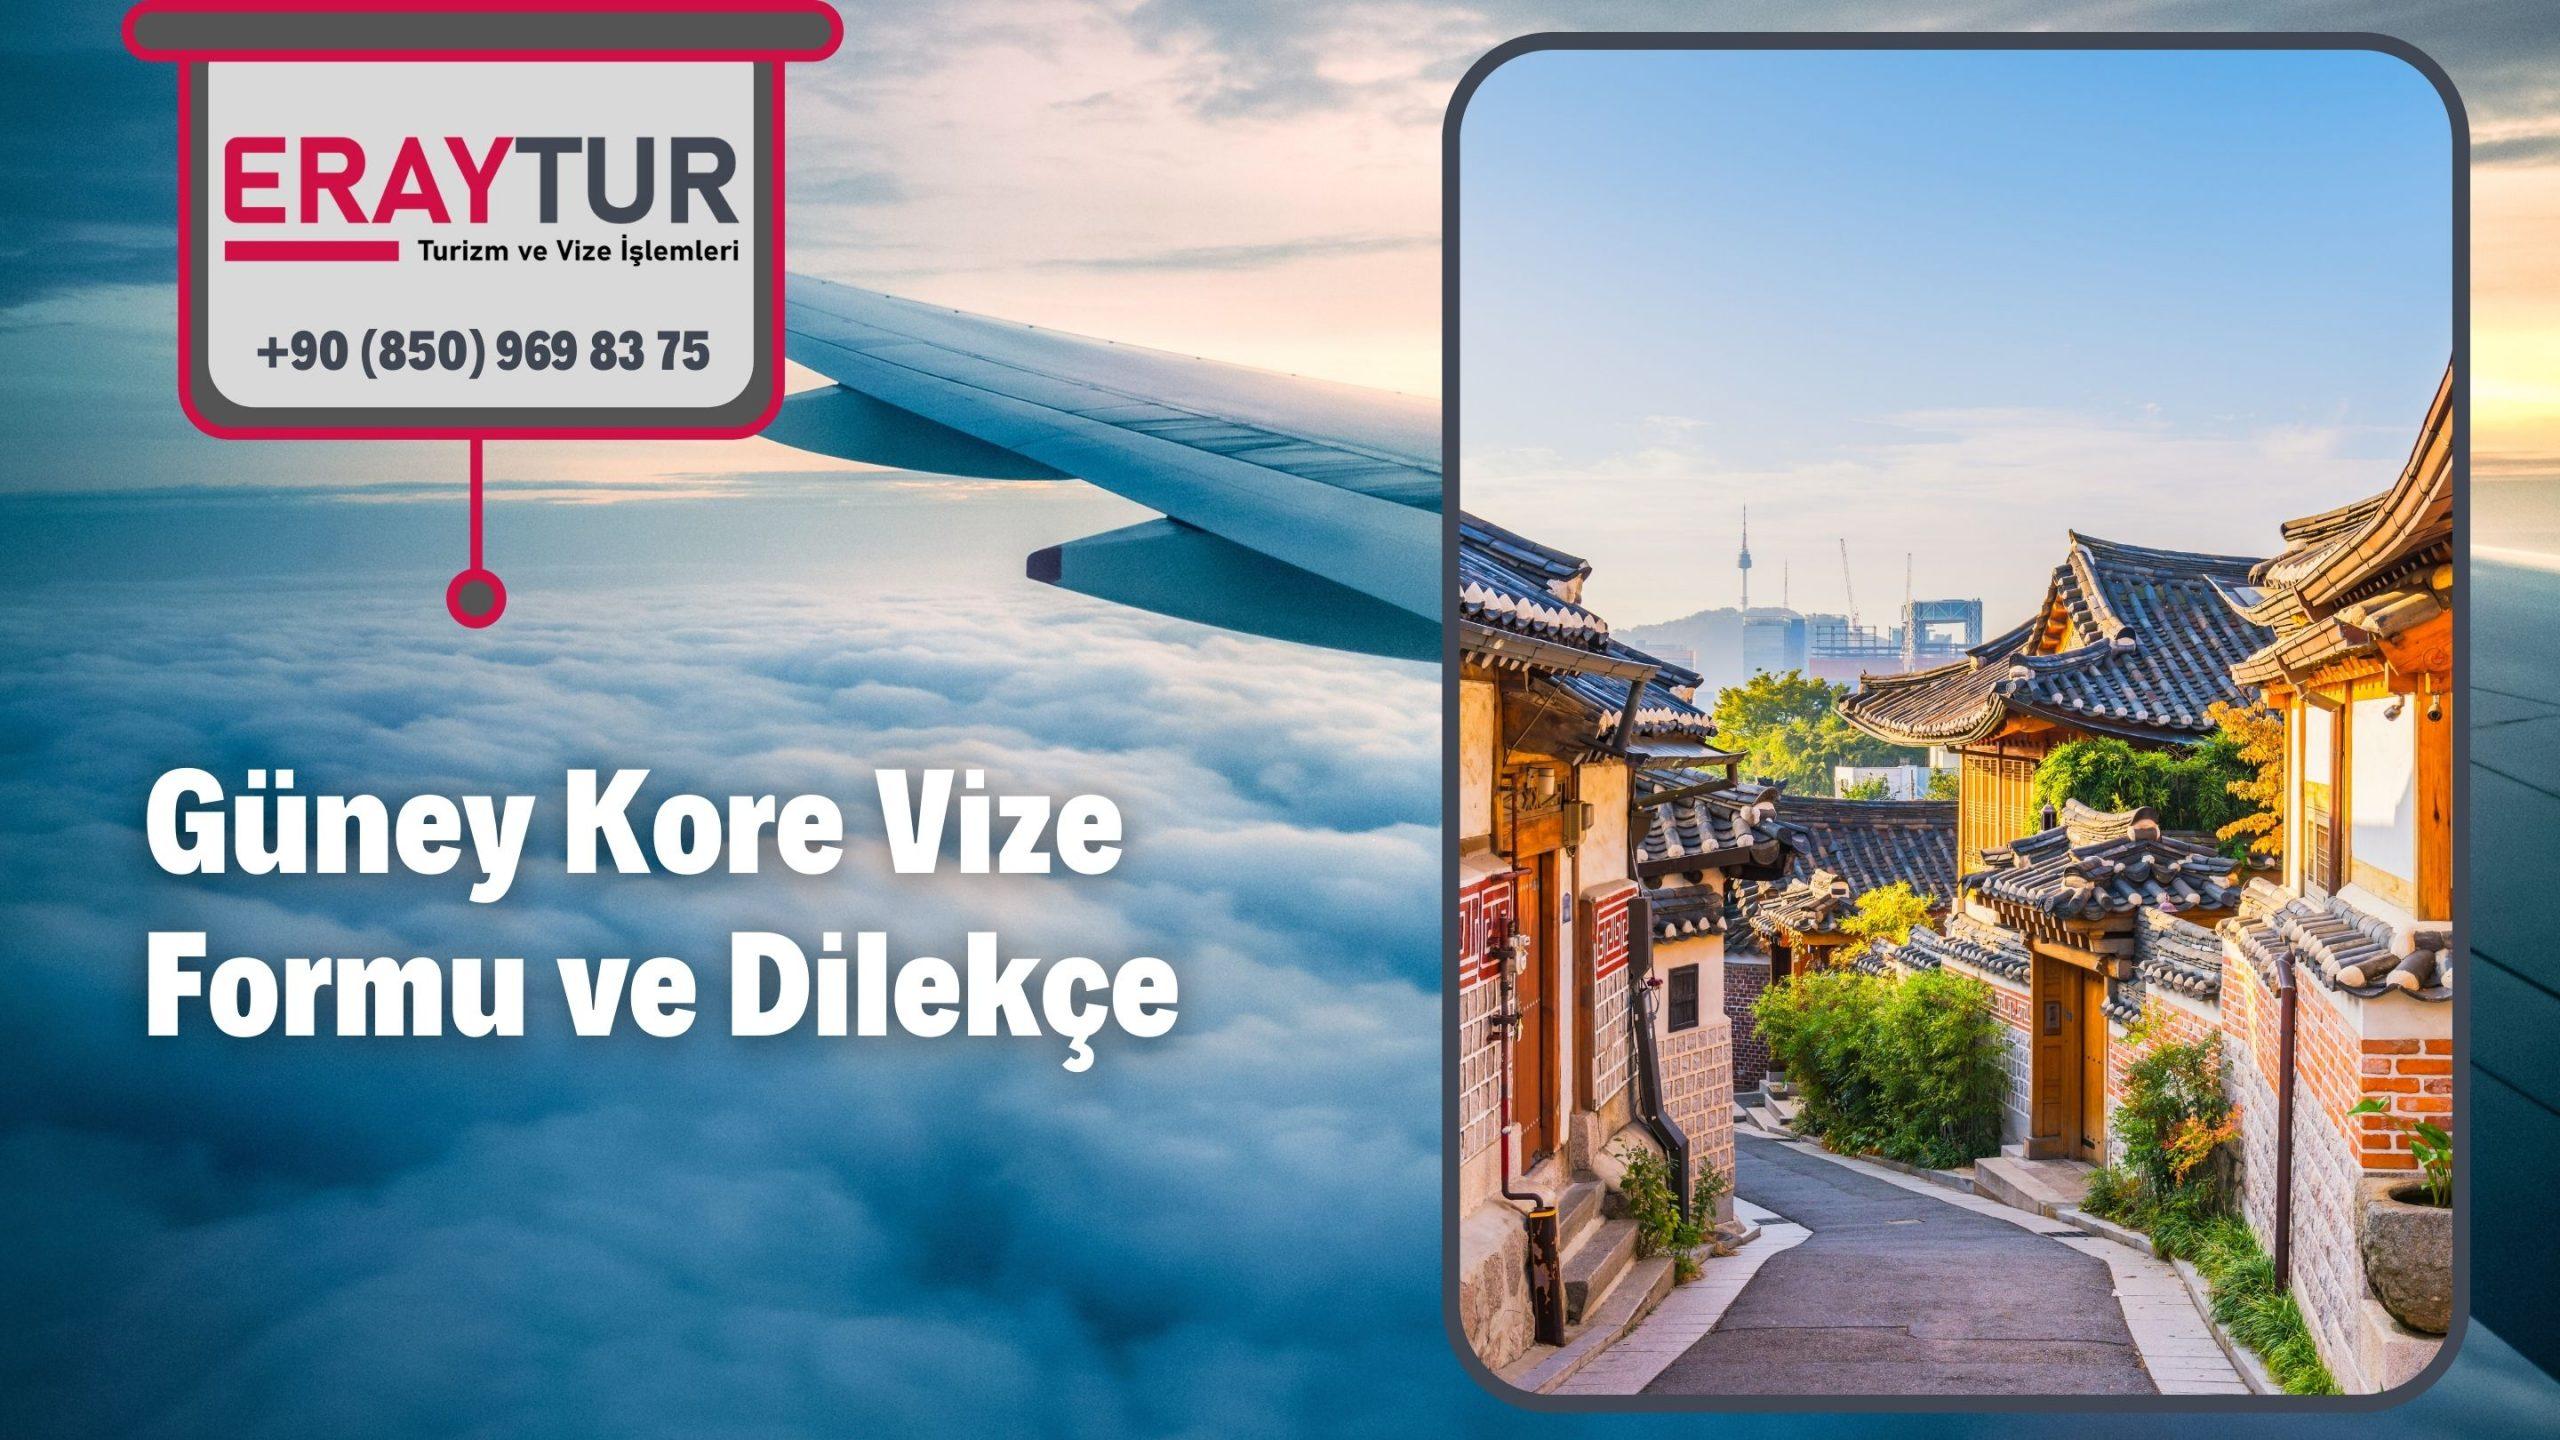 Güney Kore Vize Formu ve Dilekçe 1 – guney kore vize formu ve dilekce 1 scaled